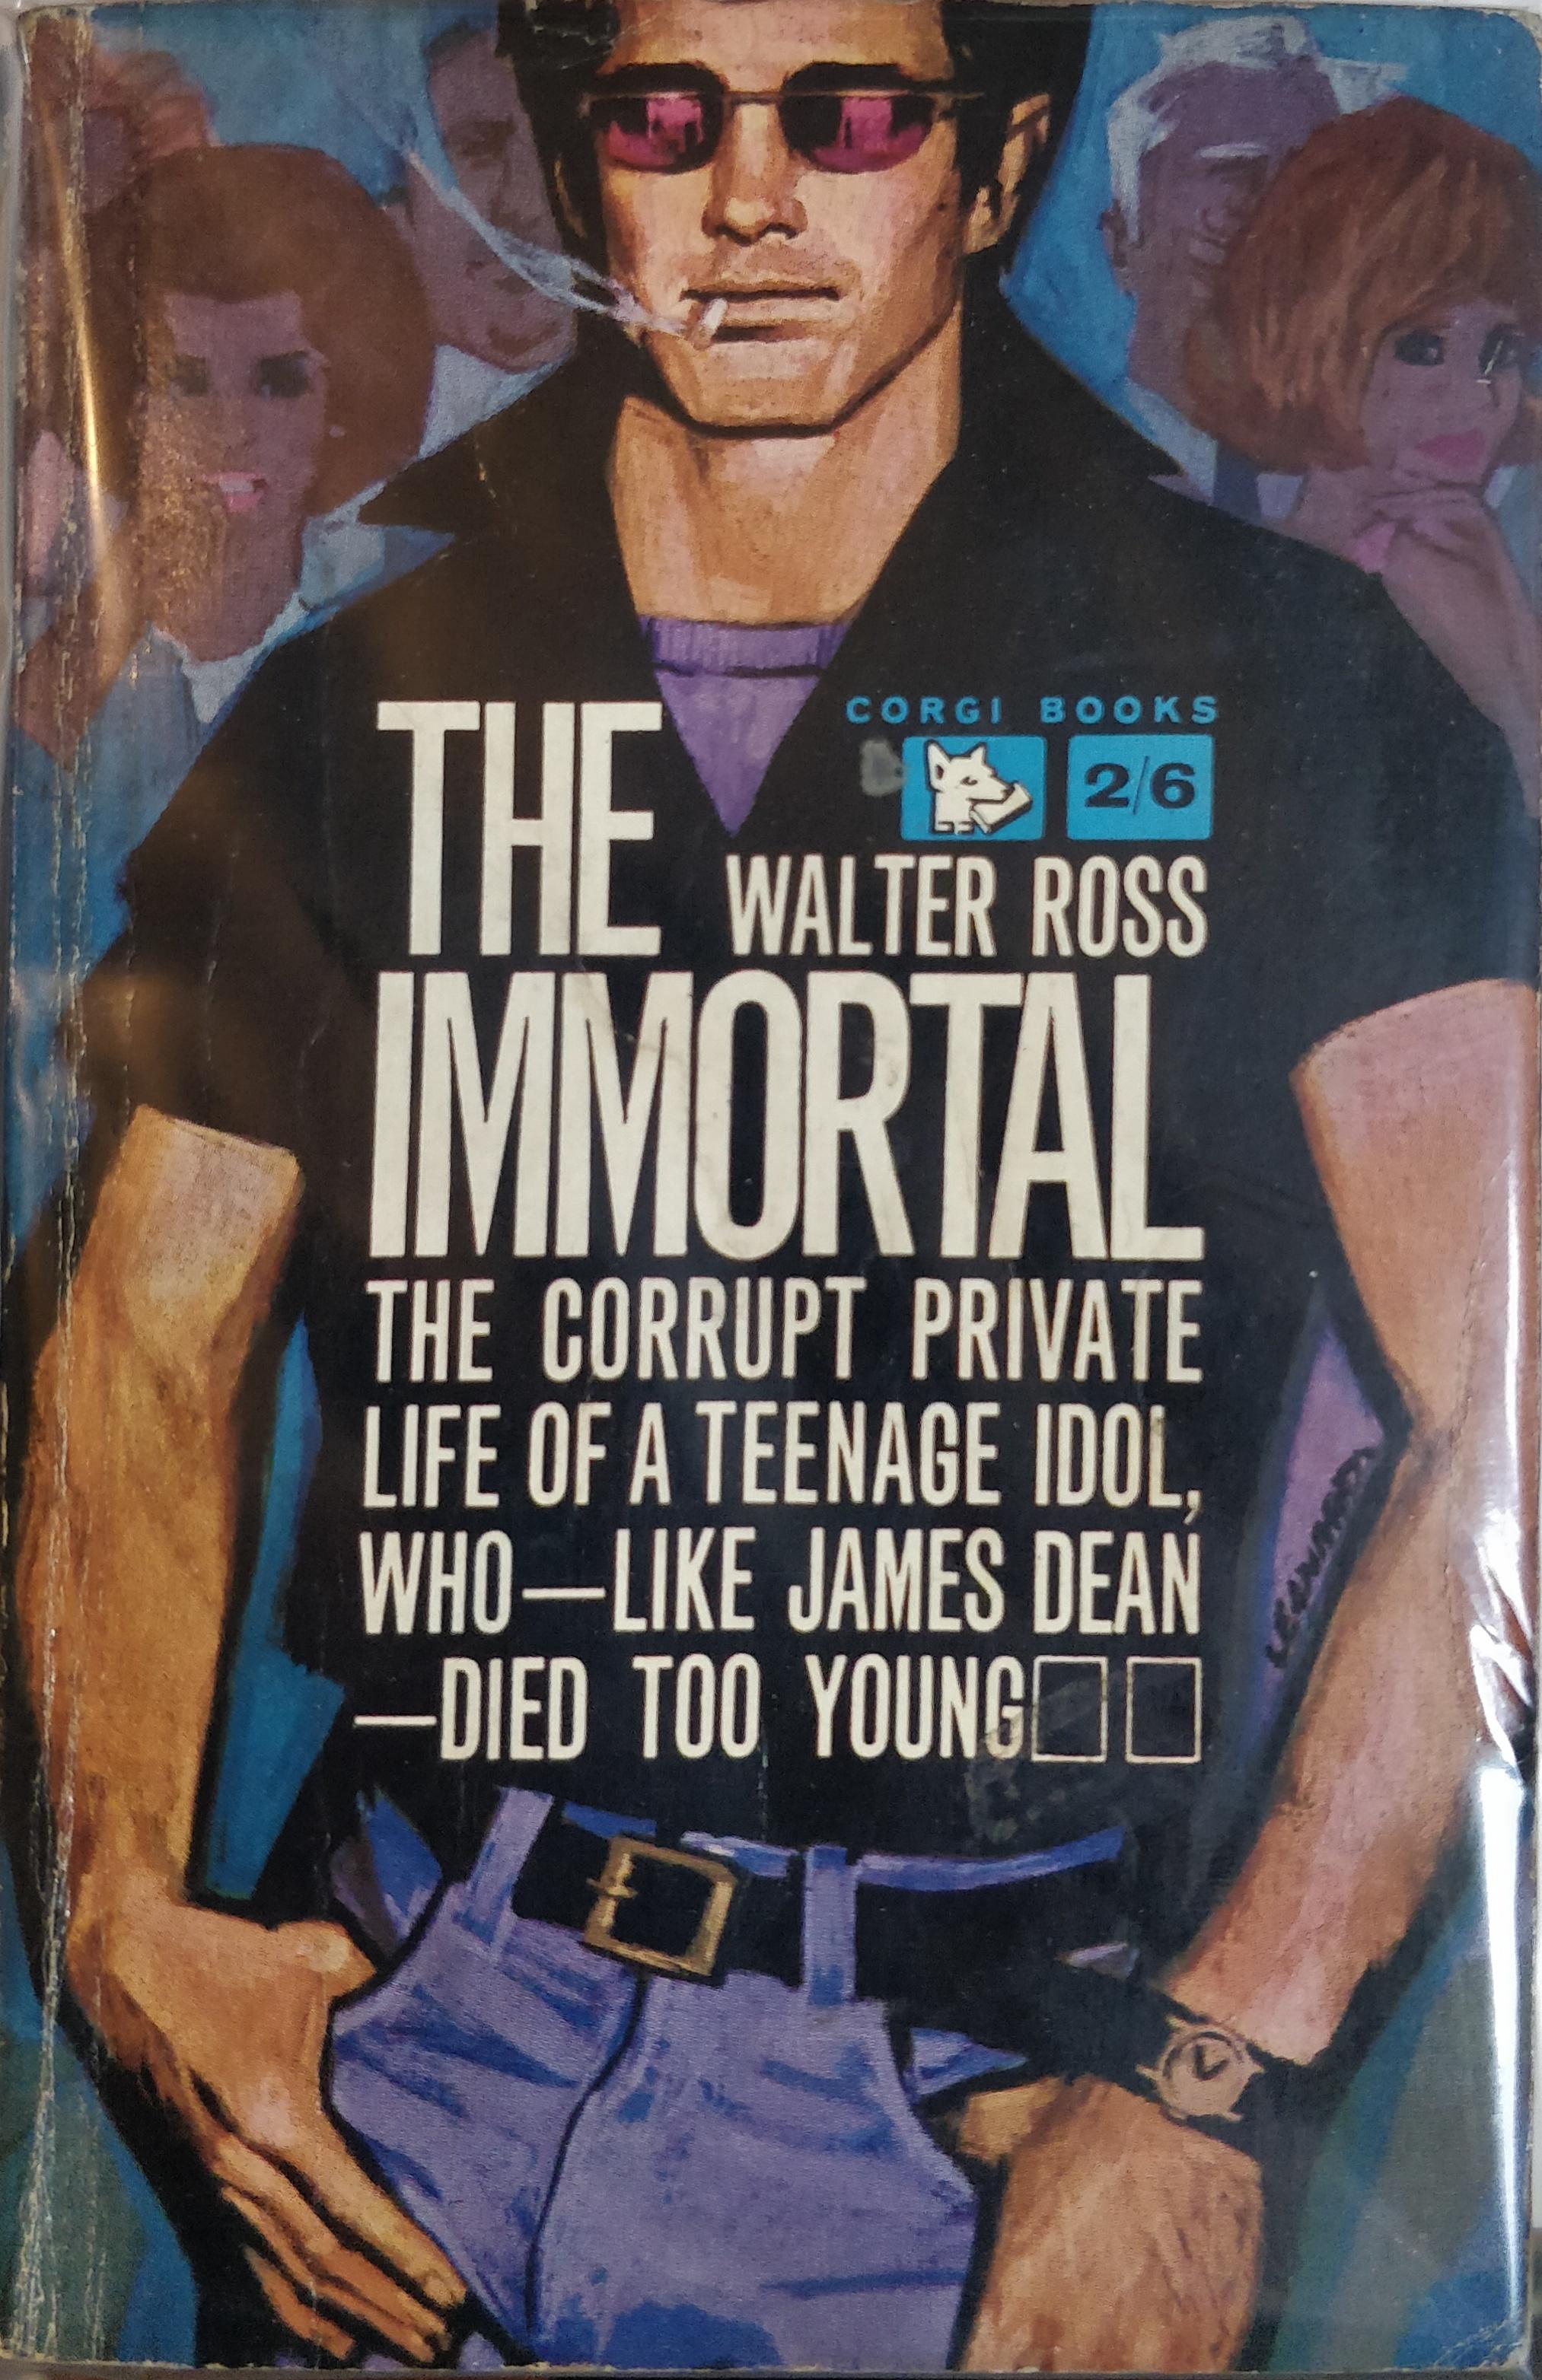 ross-walter-the-immortal